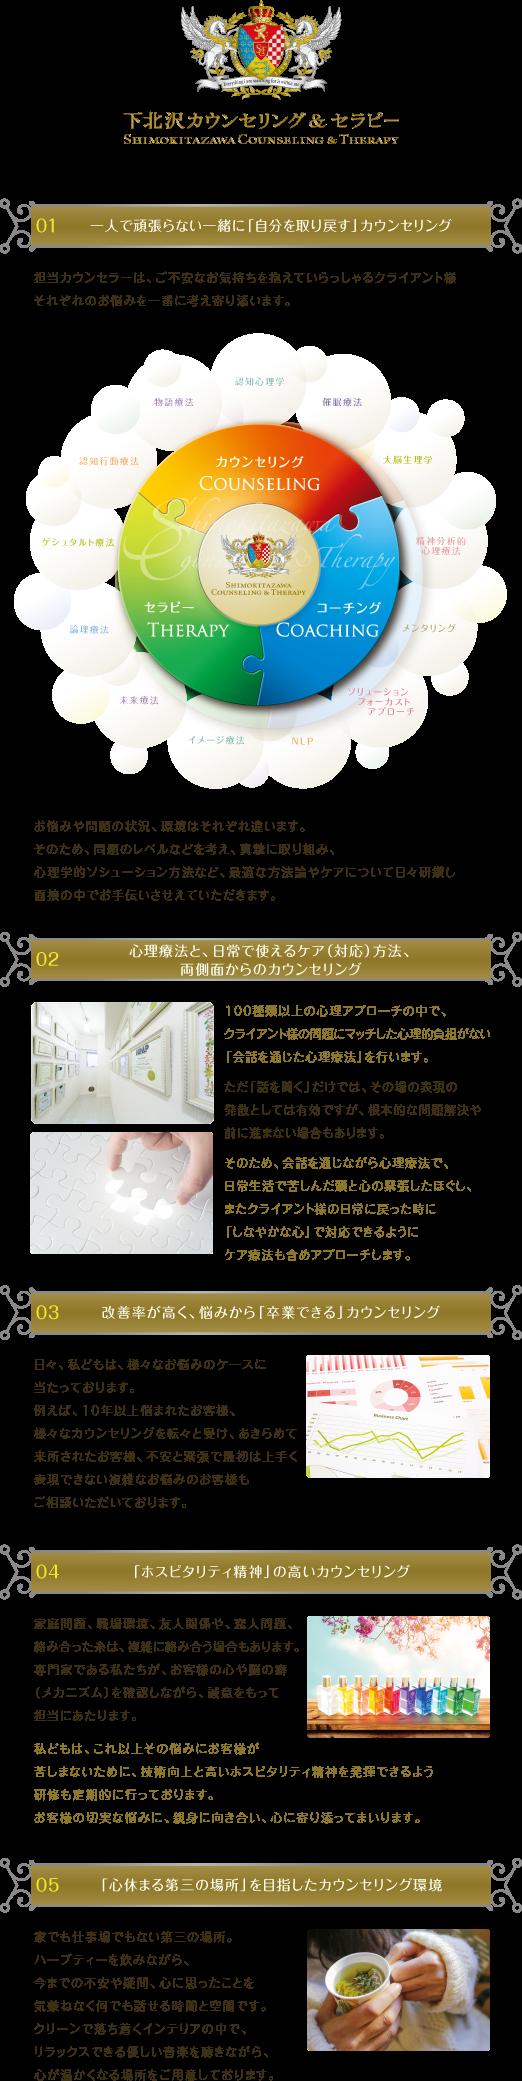 tokyo_setagaya_shimokitszawa_counseling_therapy_coaching403